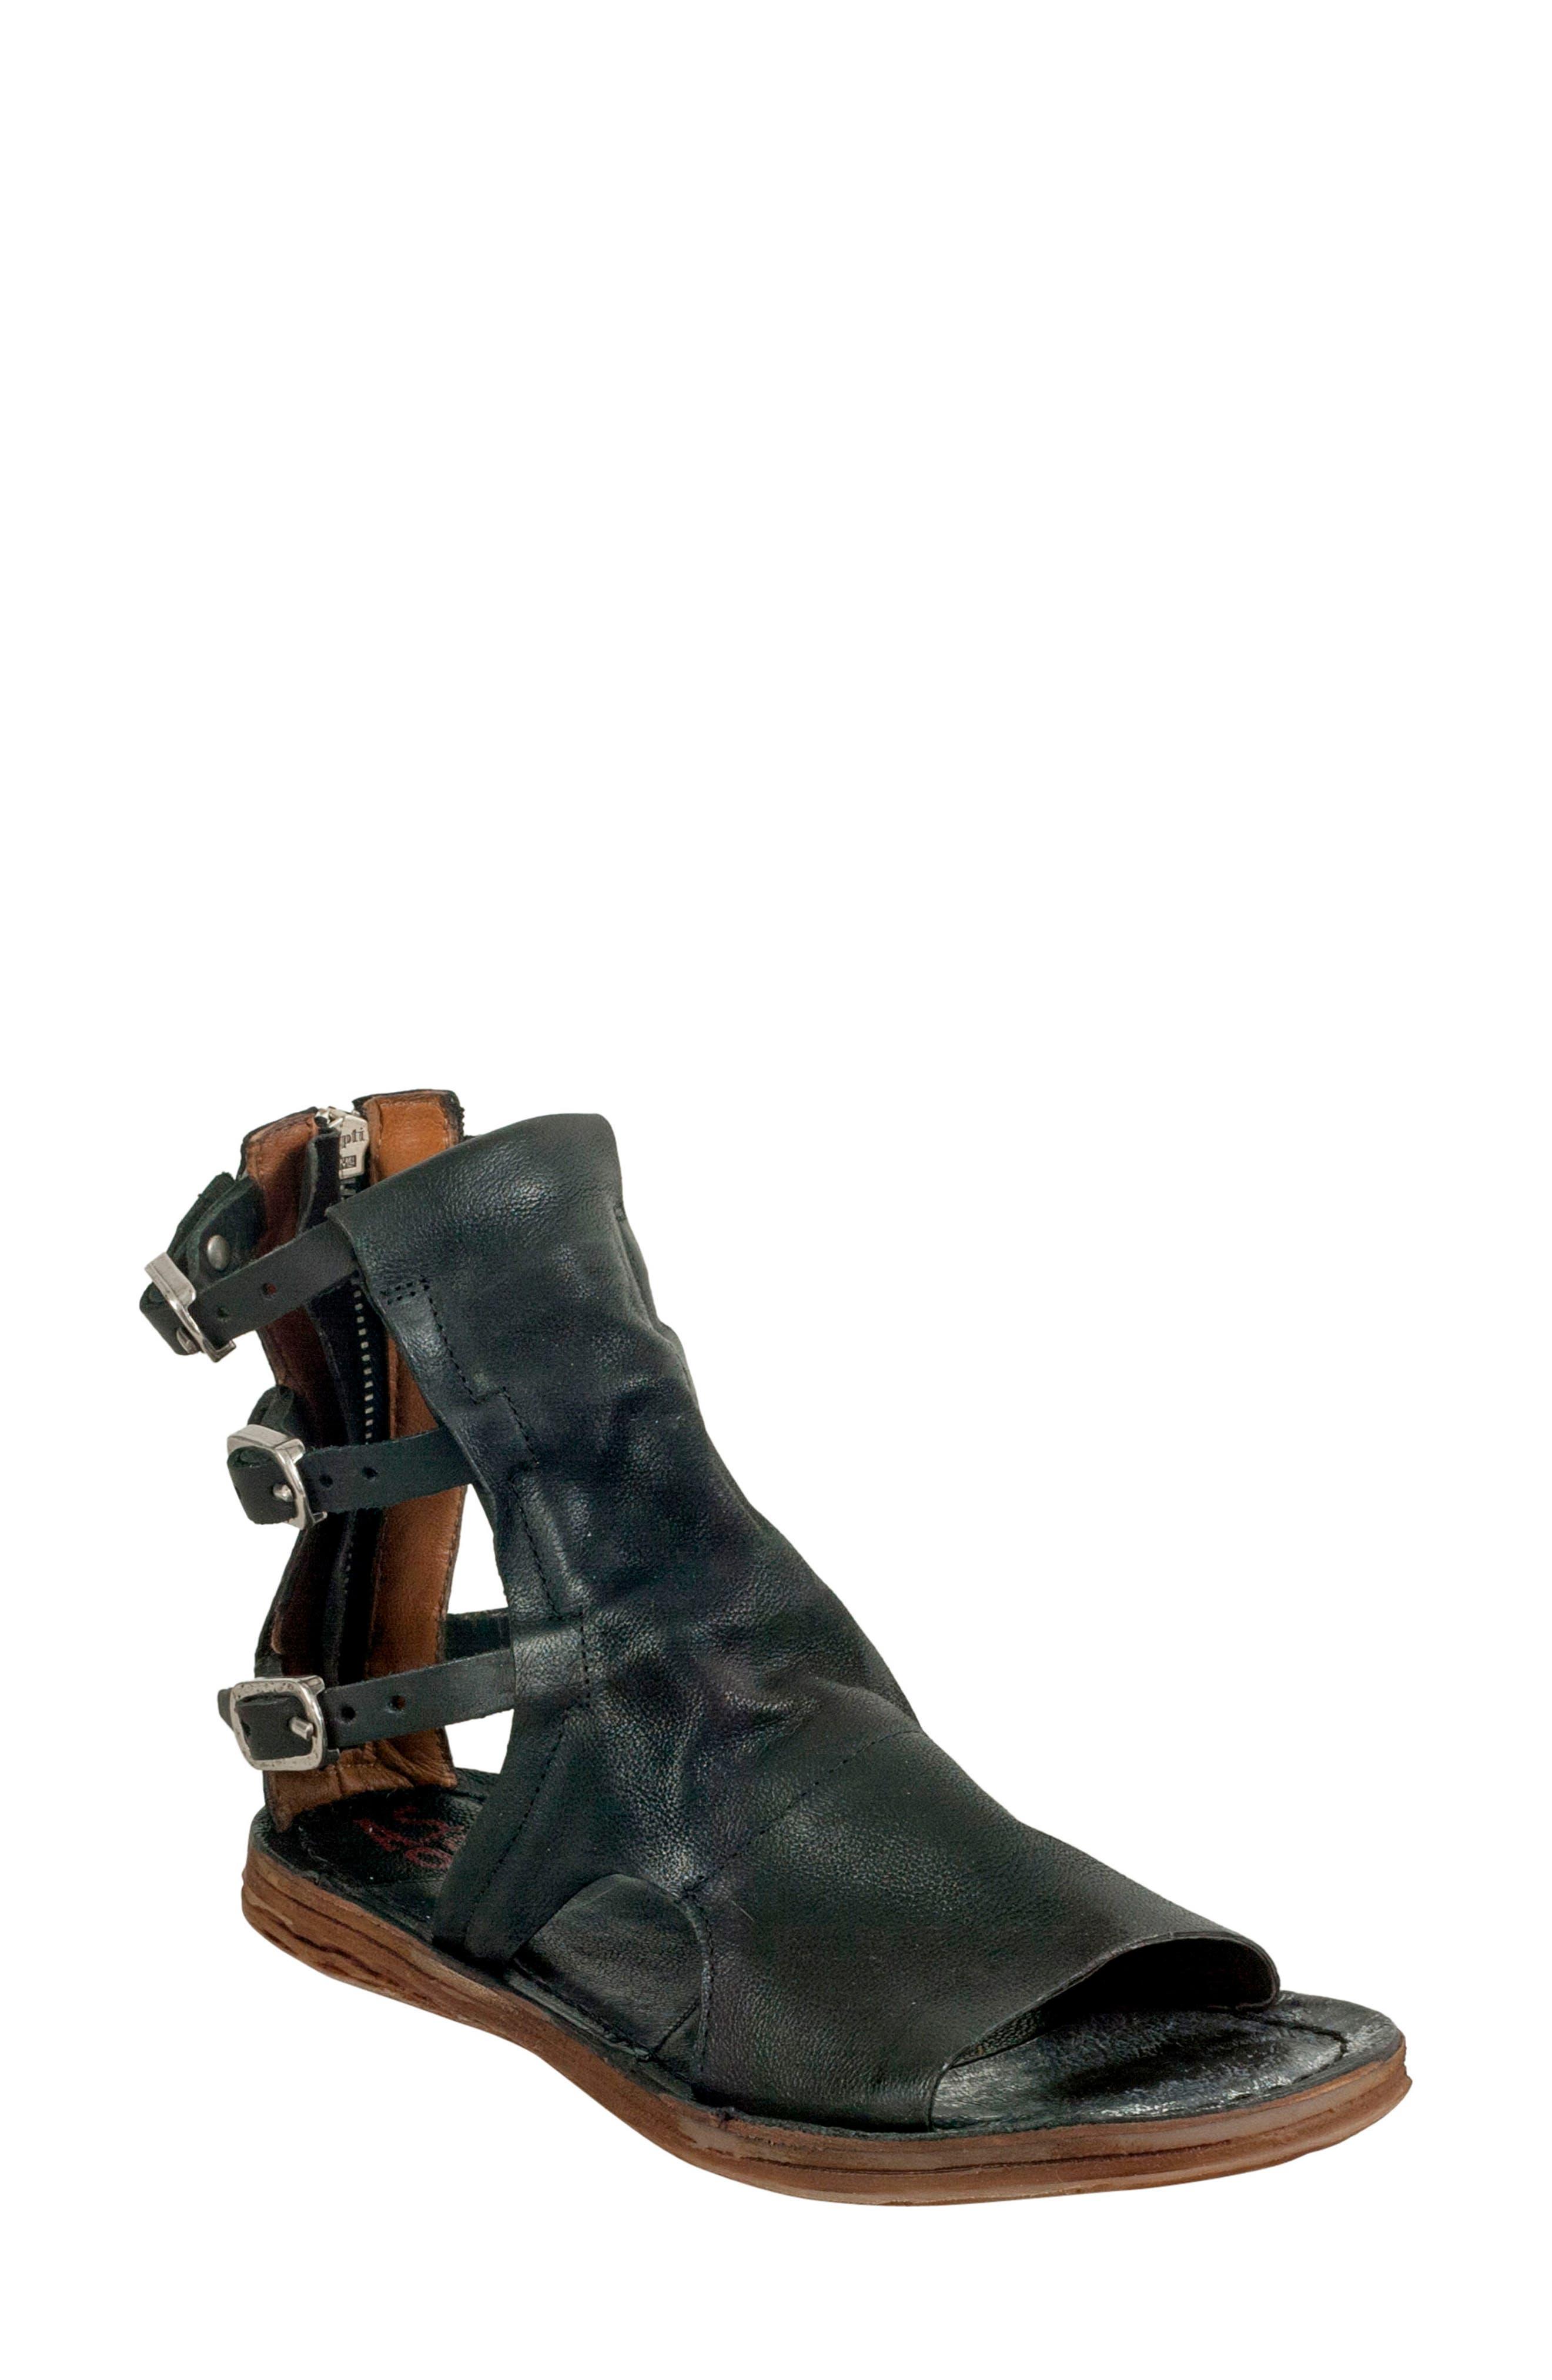 A.S.98 Ryde Sandal, Black Leather